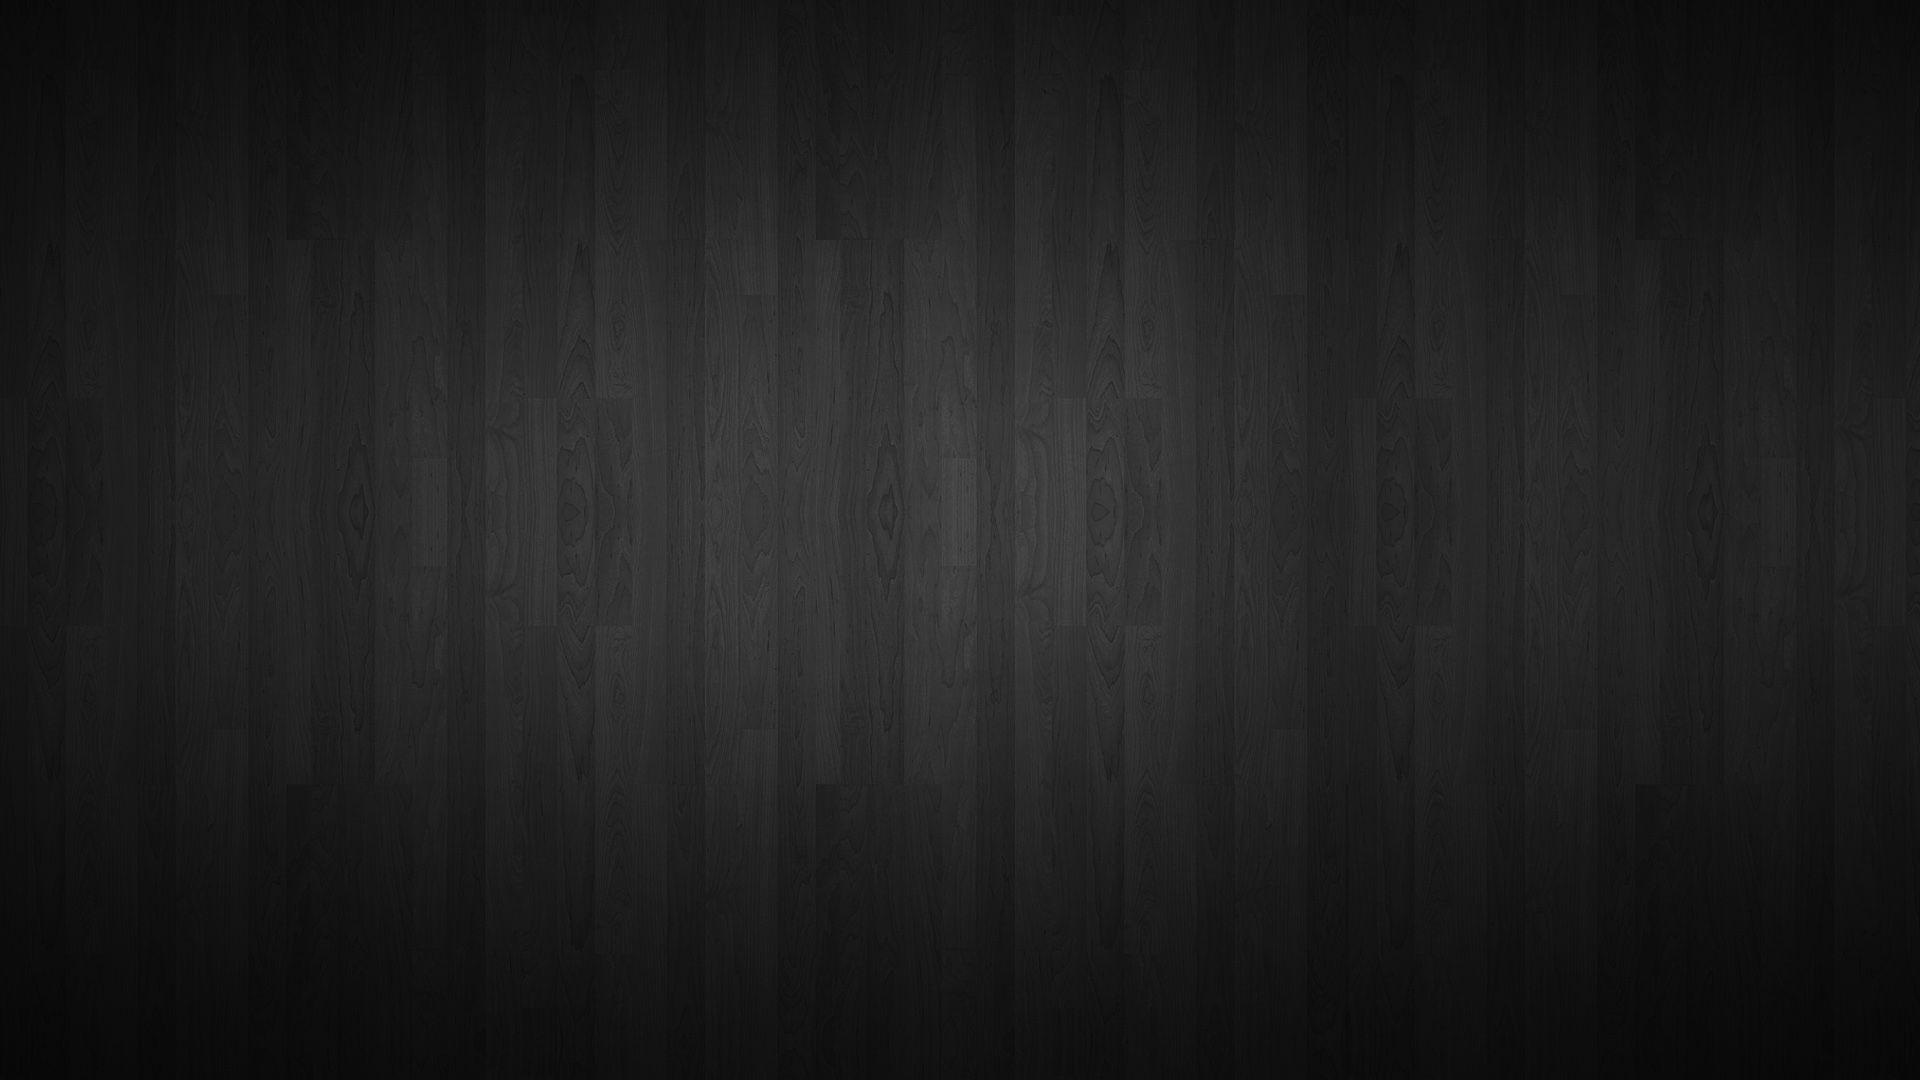 Wood Grain Wallpapers HD - Wallpaper Cave